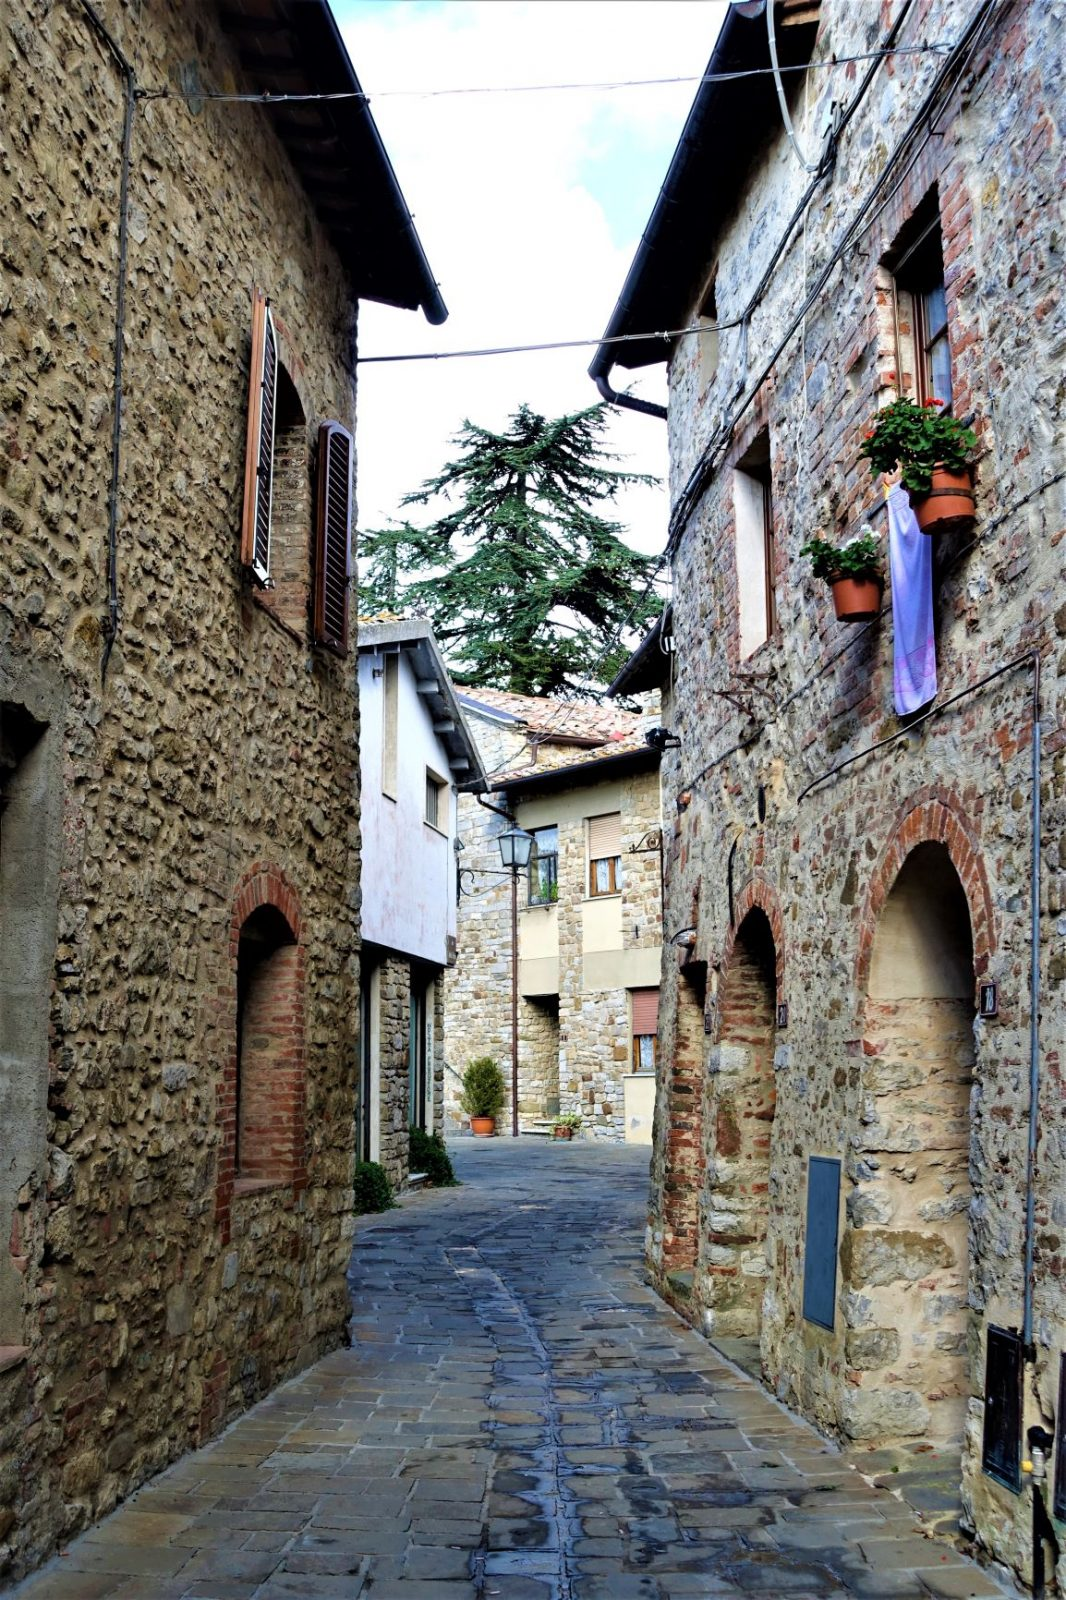 Landsby i Toscana